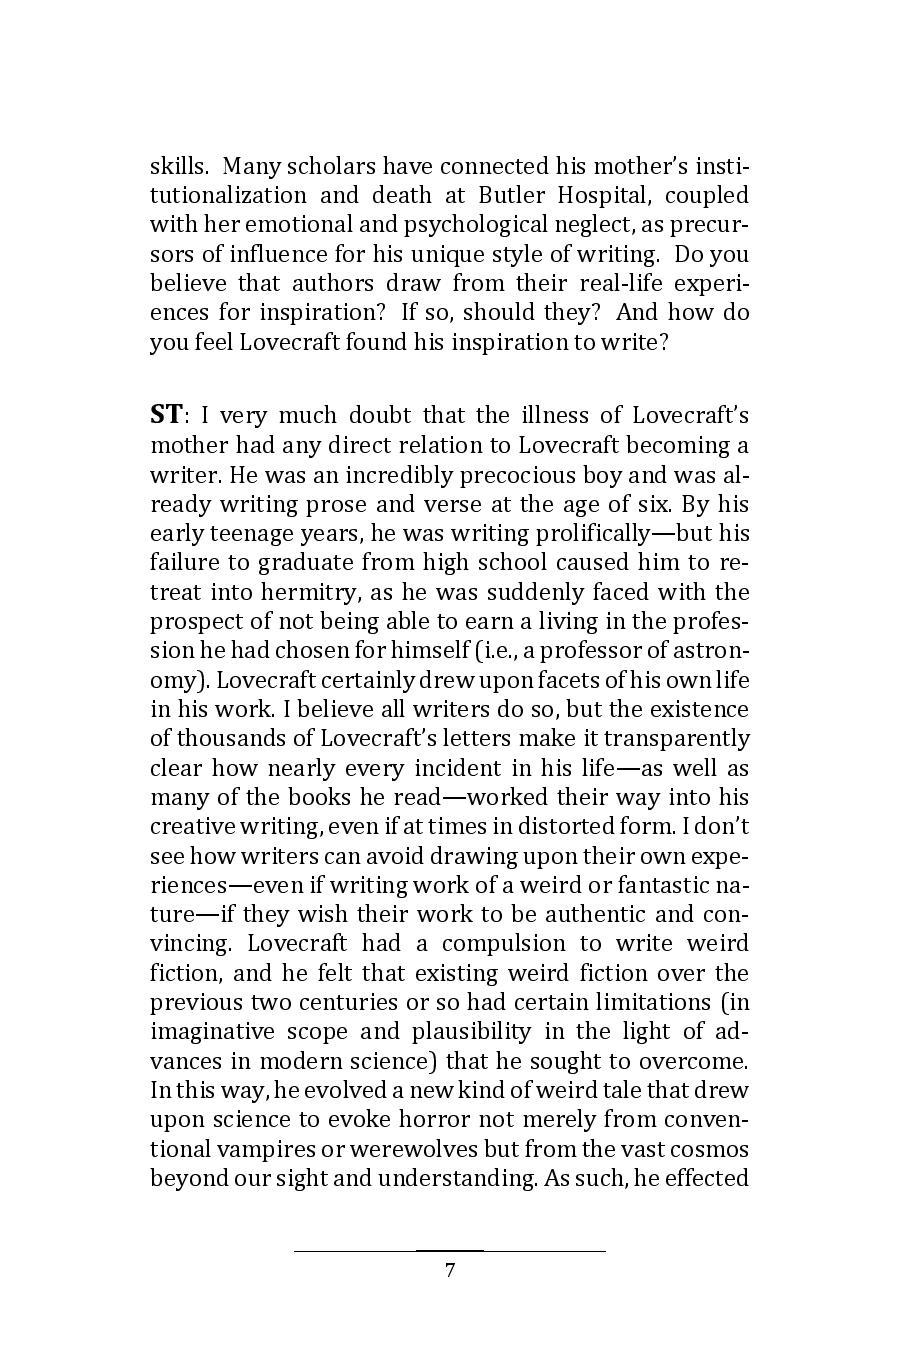 Hinnom Magazine 001 Manuscript 10-page-011